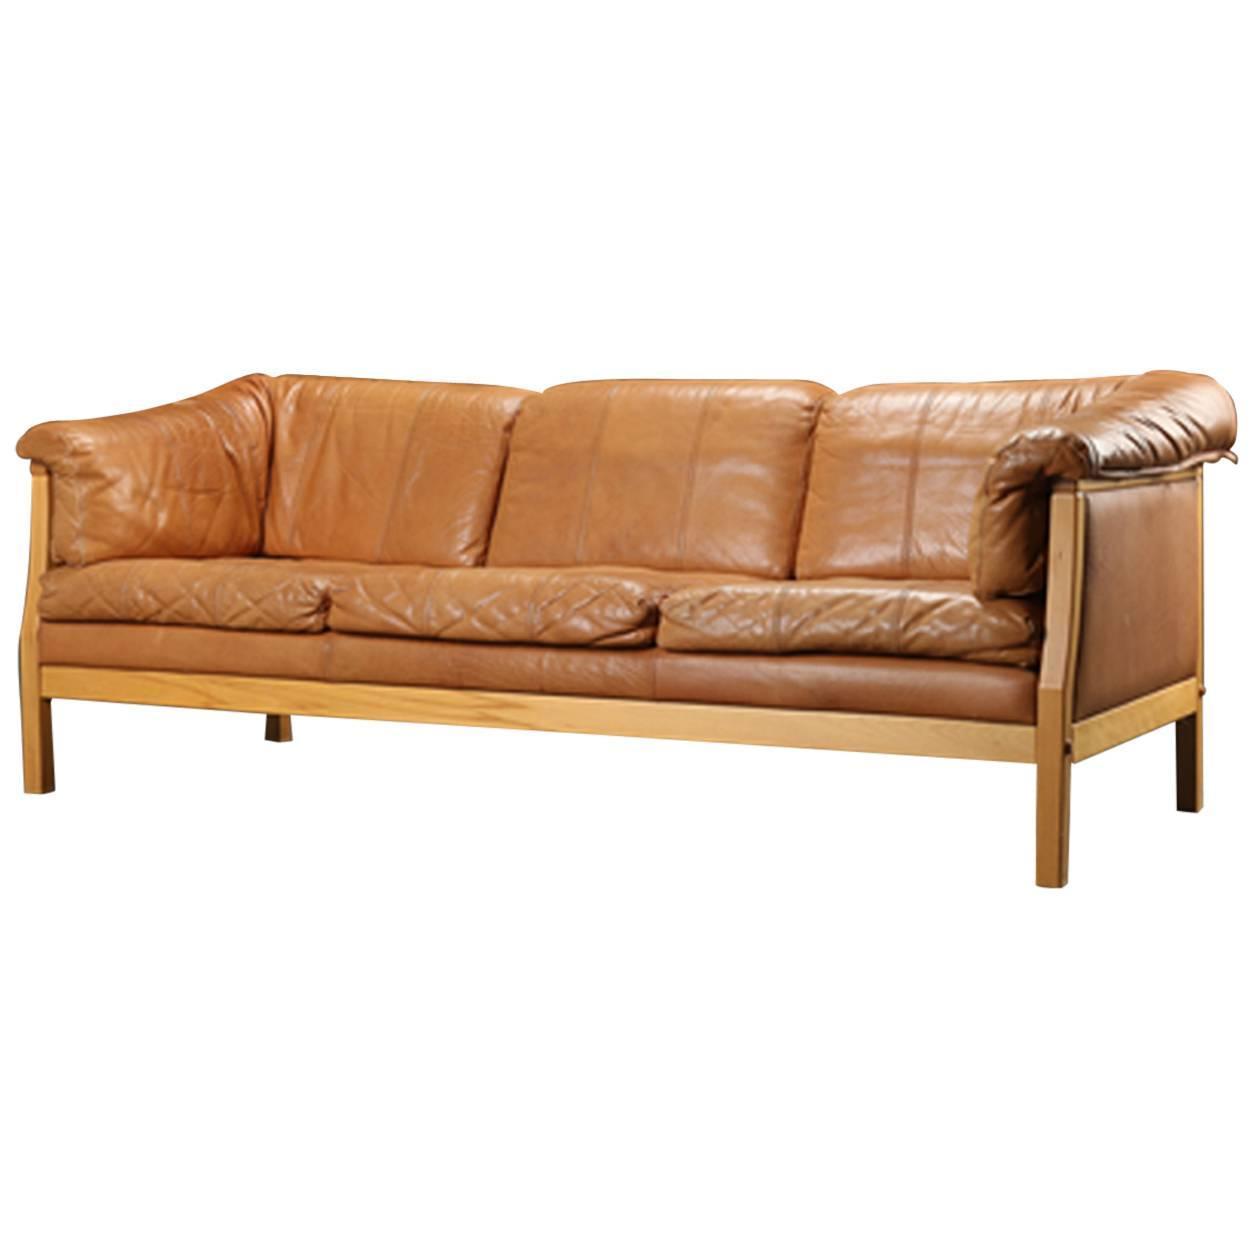 caramel colored leather sofas washable slipcovered danish modern sofa at 1stdibs